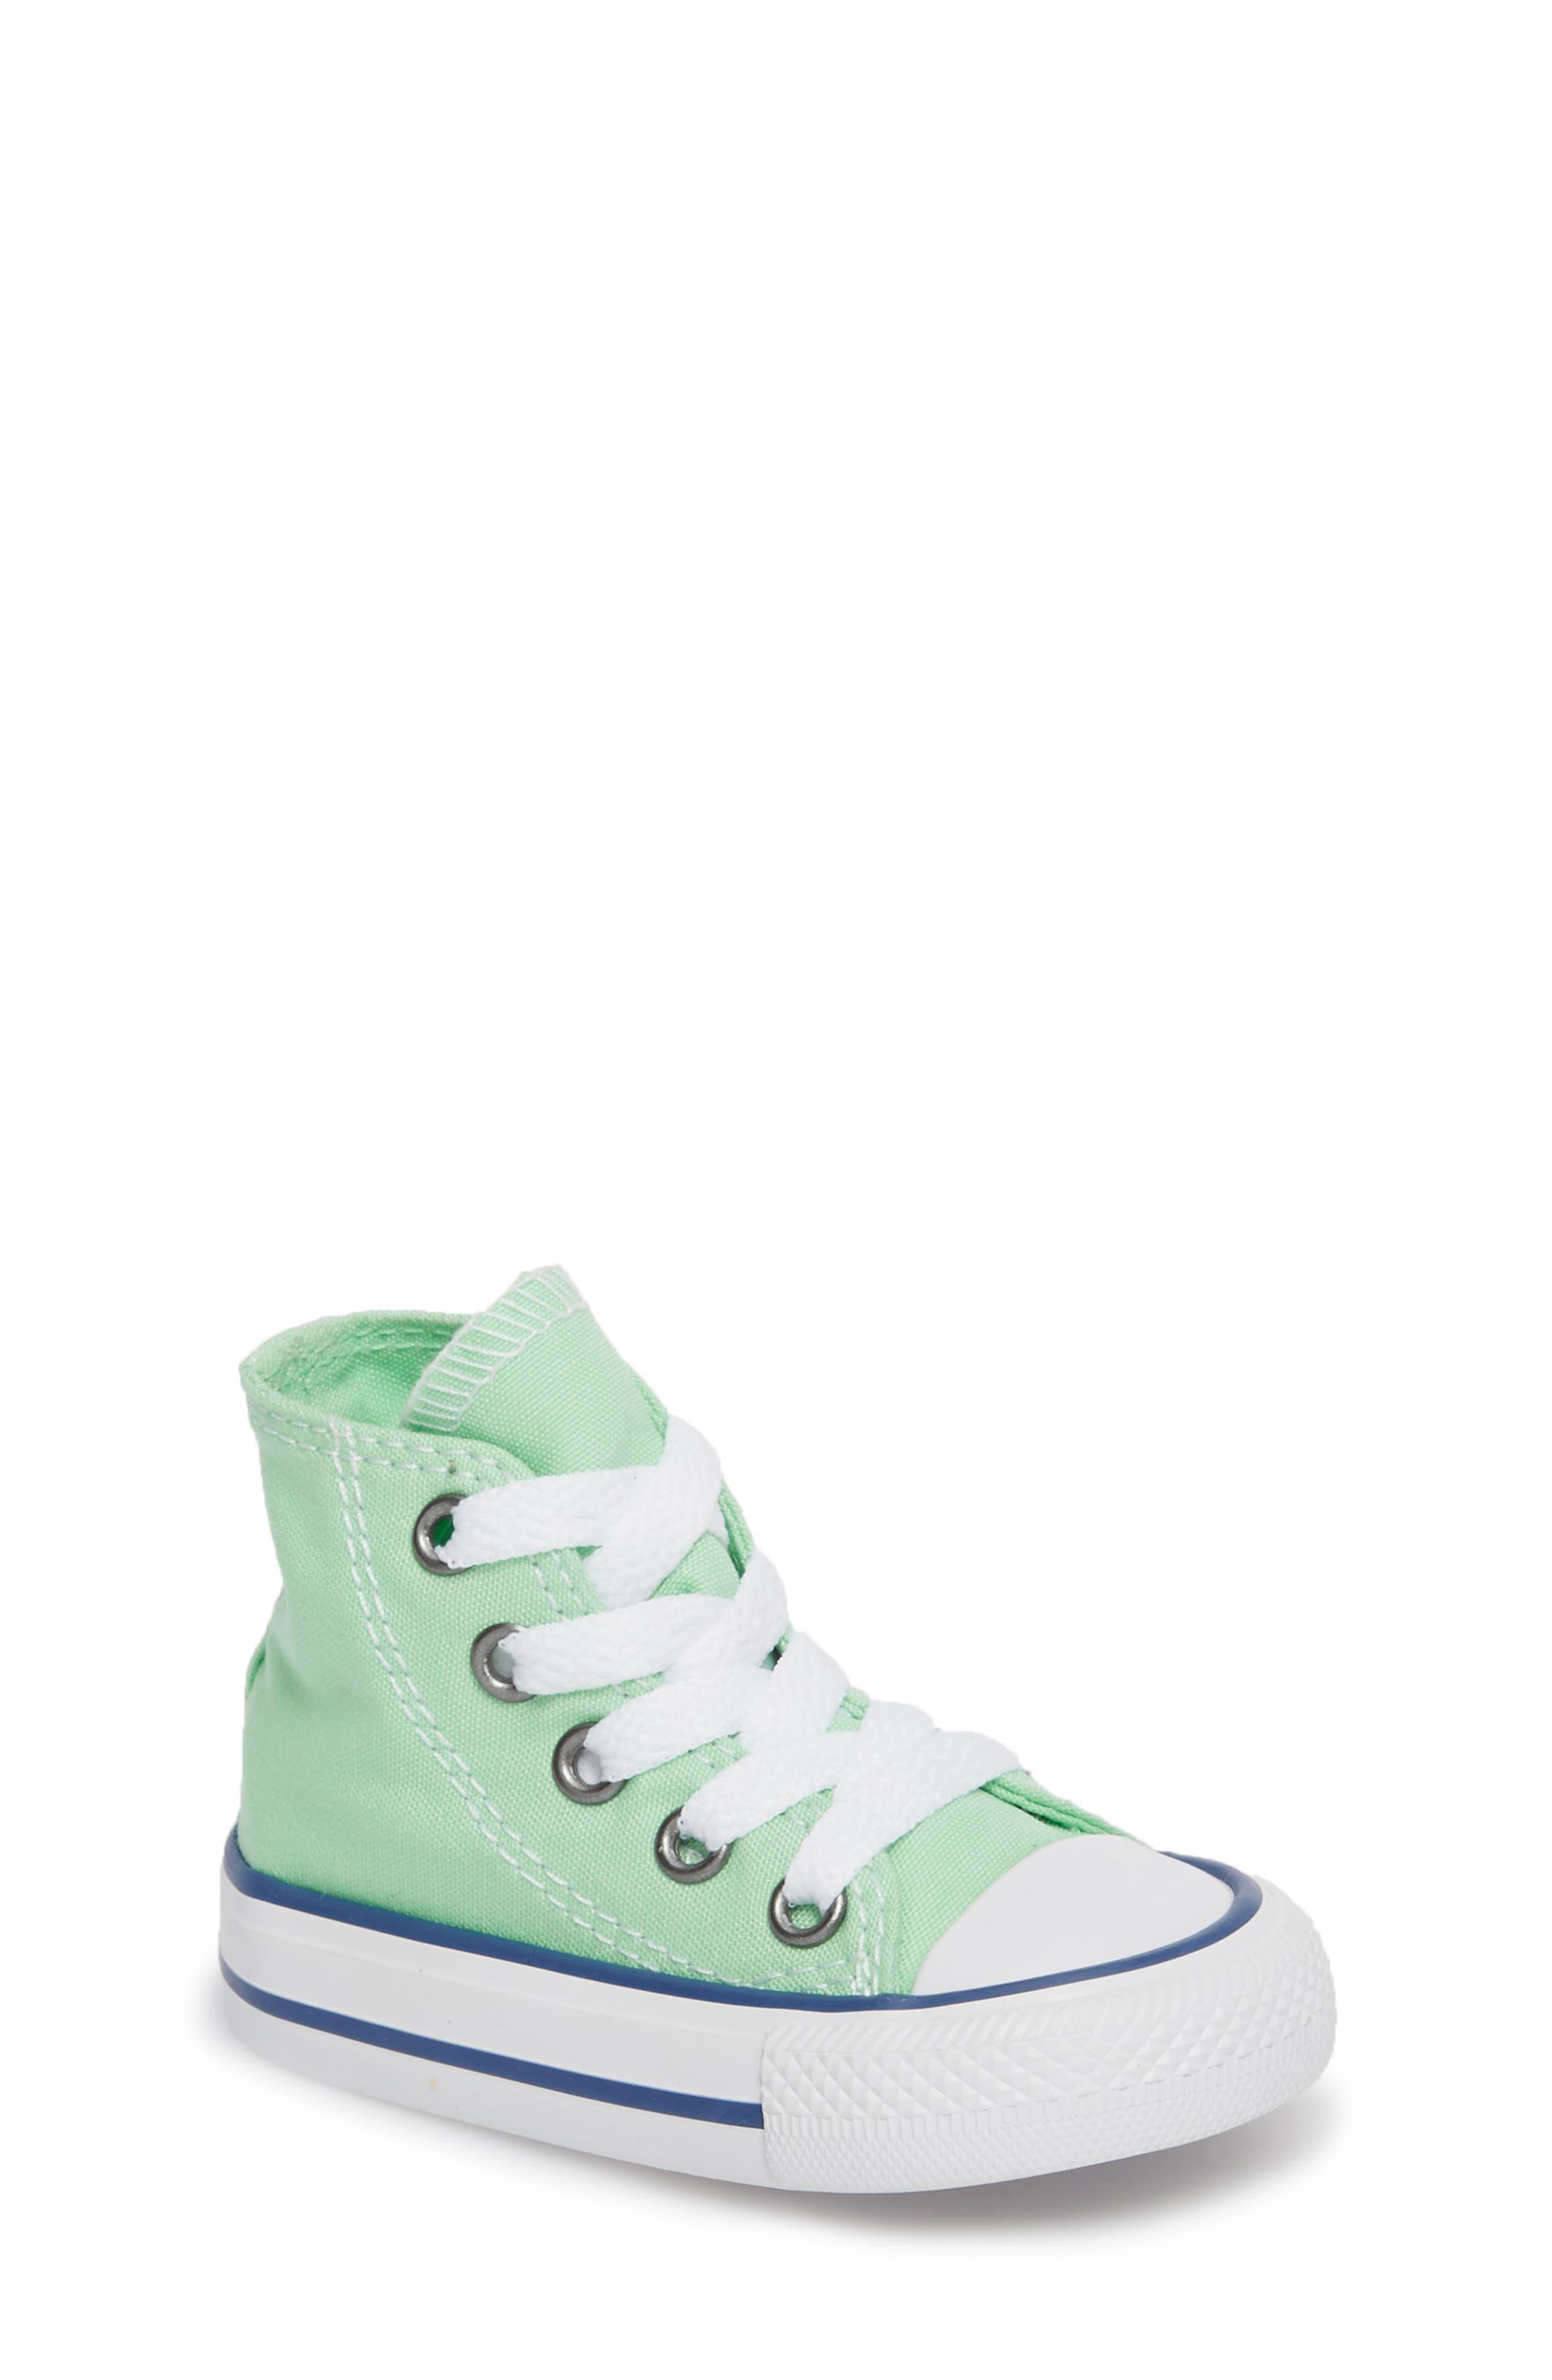 Chuck Taylor<sup>®</sup> All Star<sup>®</sup> Seasonal High Top Sneaker,                         Main,                         color, 336